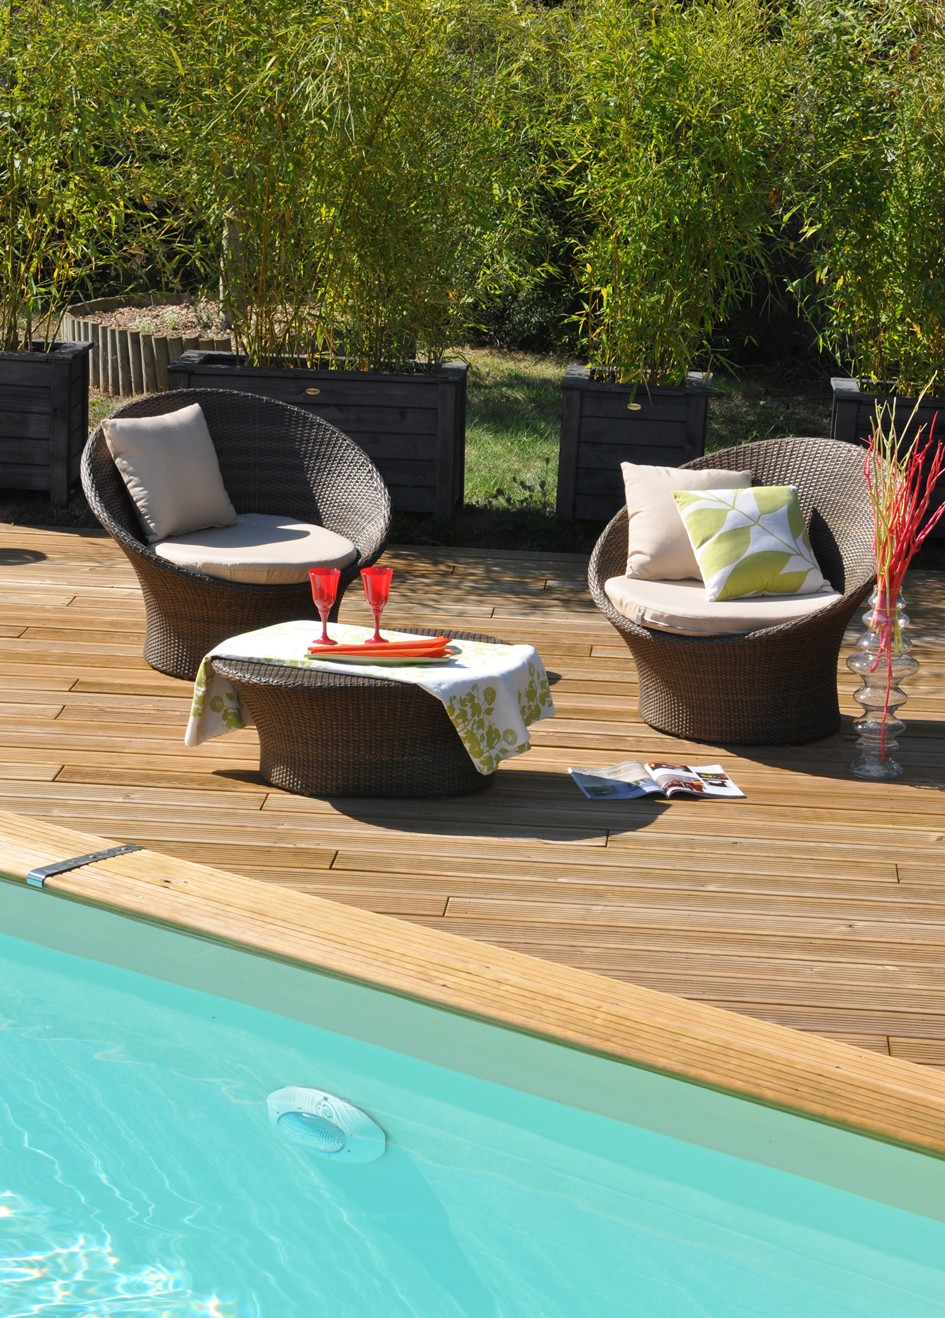 piscine bois enterr e maeva 10x5m escalier. Black Bedroom Furniture Sets. Home Design Ideas